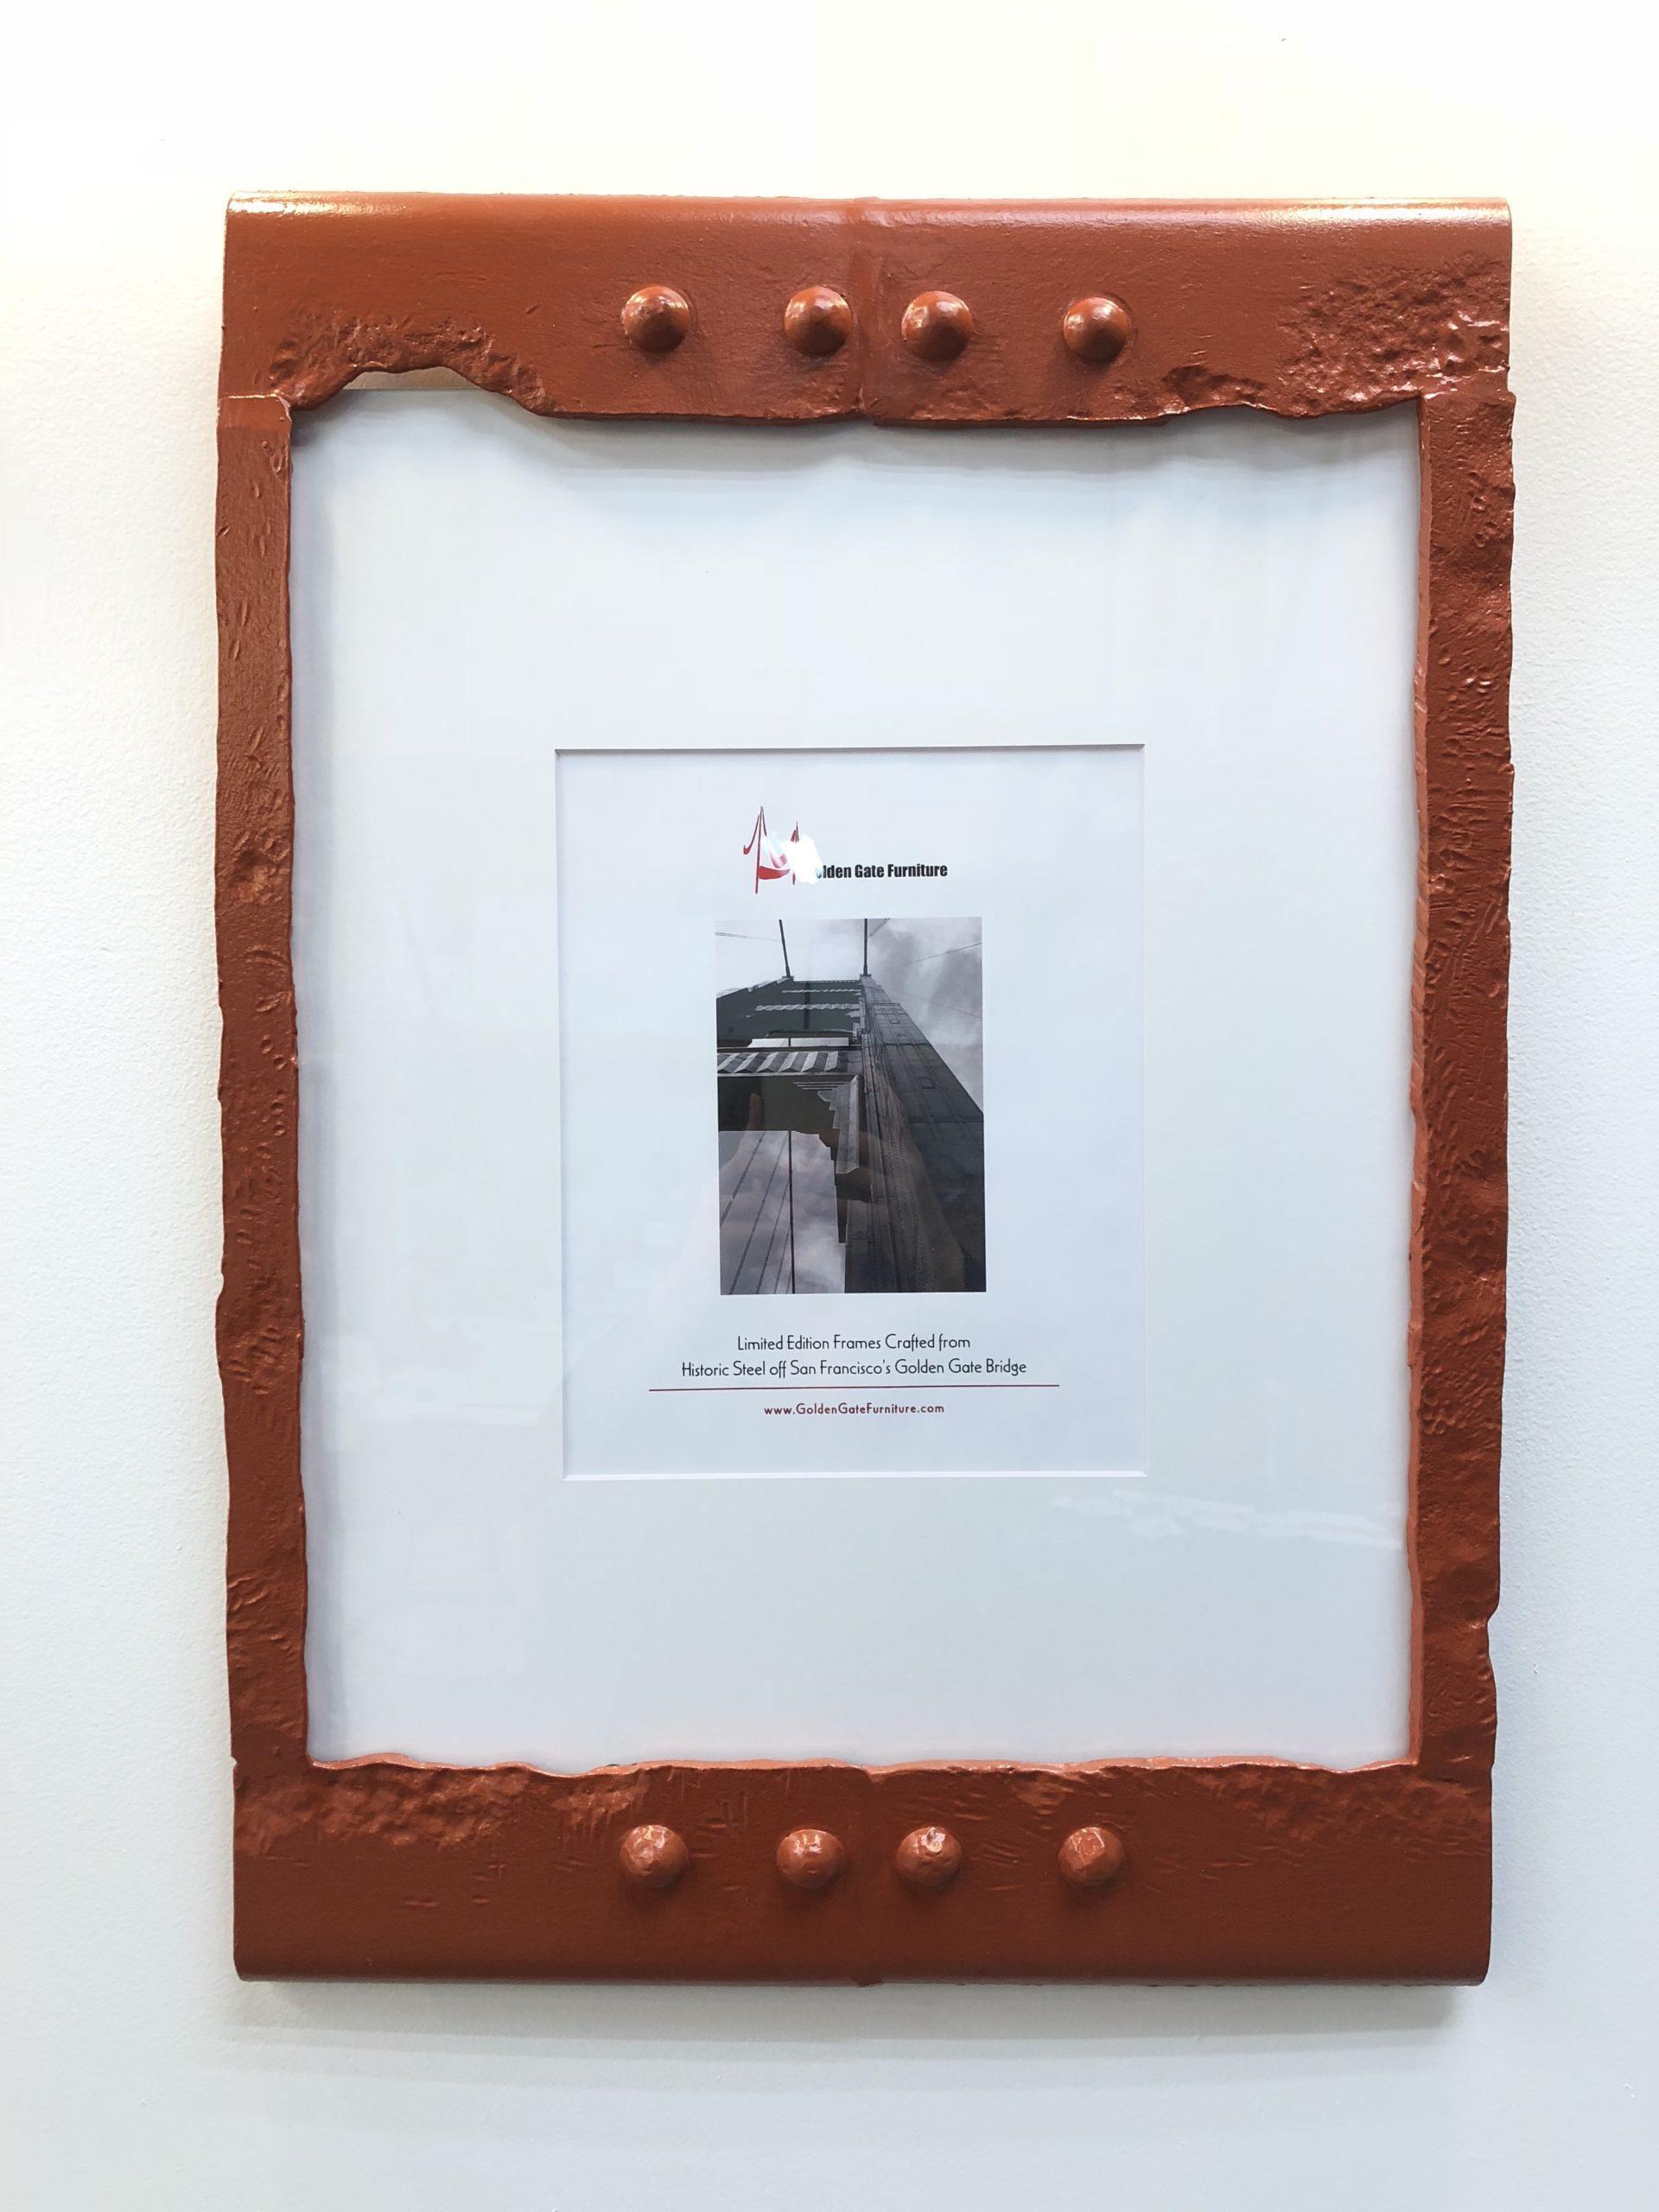 Golden Gate Bridge Steel - Octavia Picture Frame